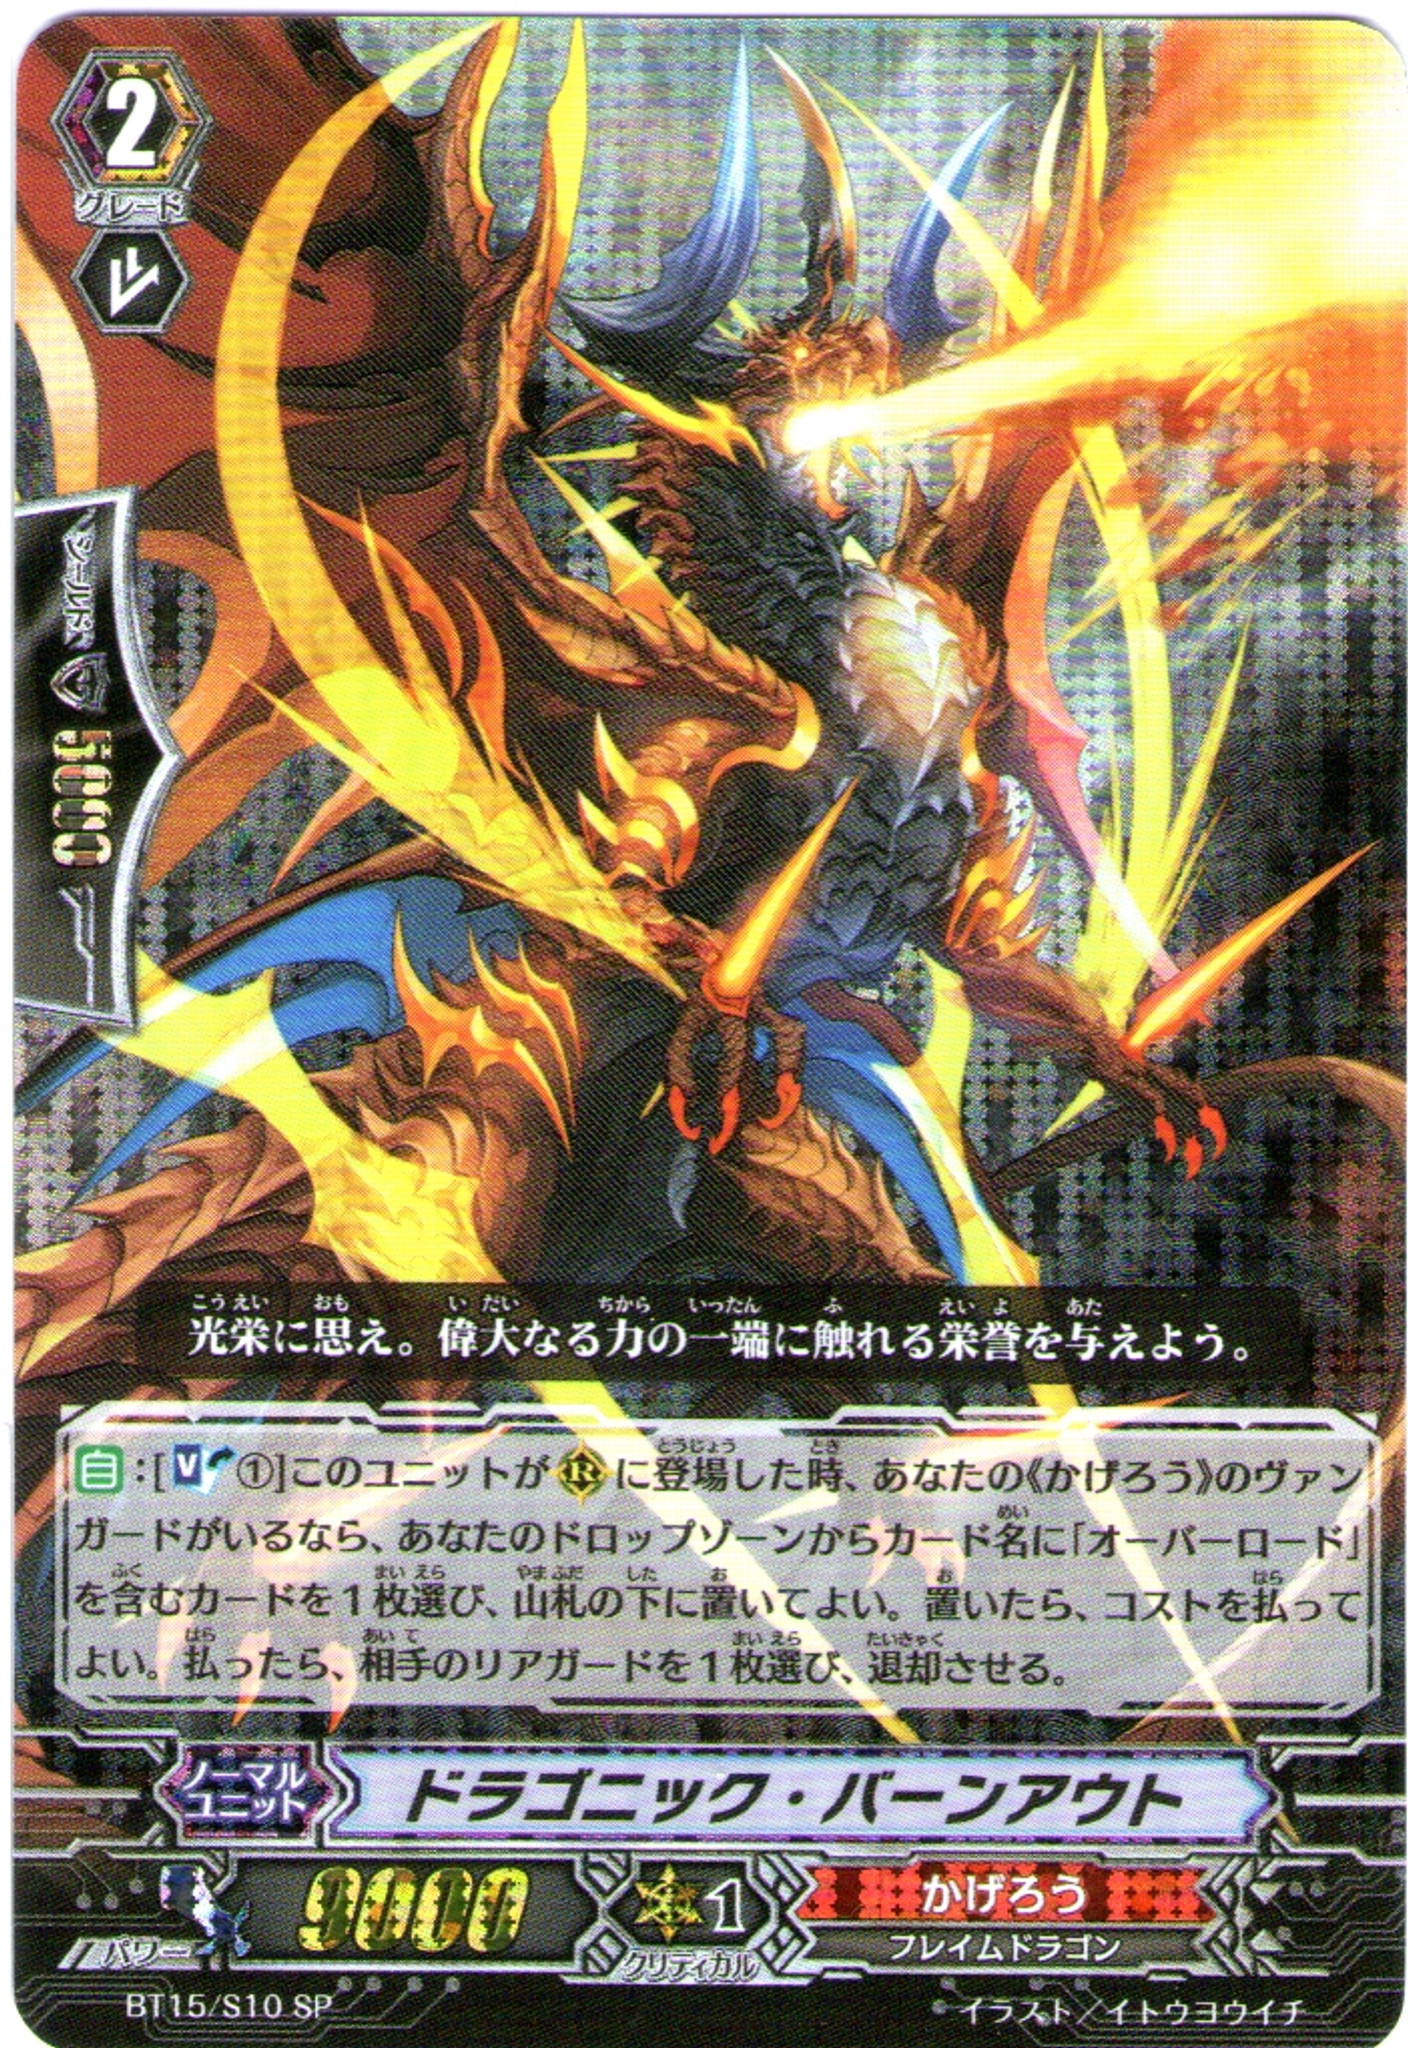 Cardfight! Please Select Cards Vanguard G-BT02 SP single cards